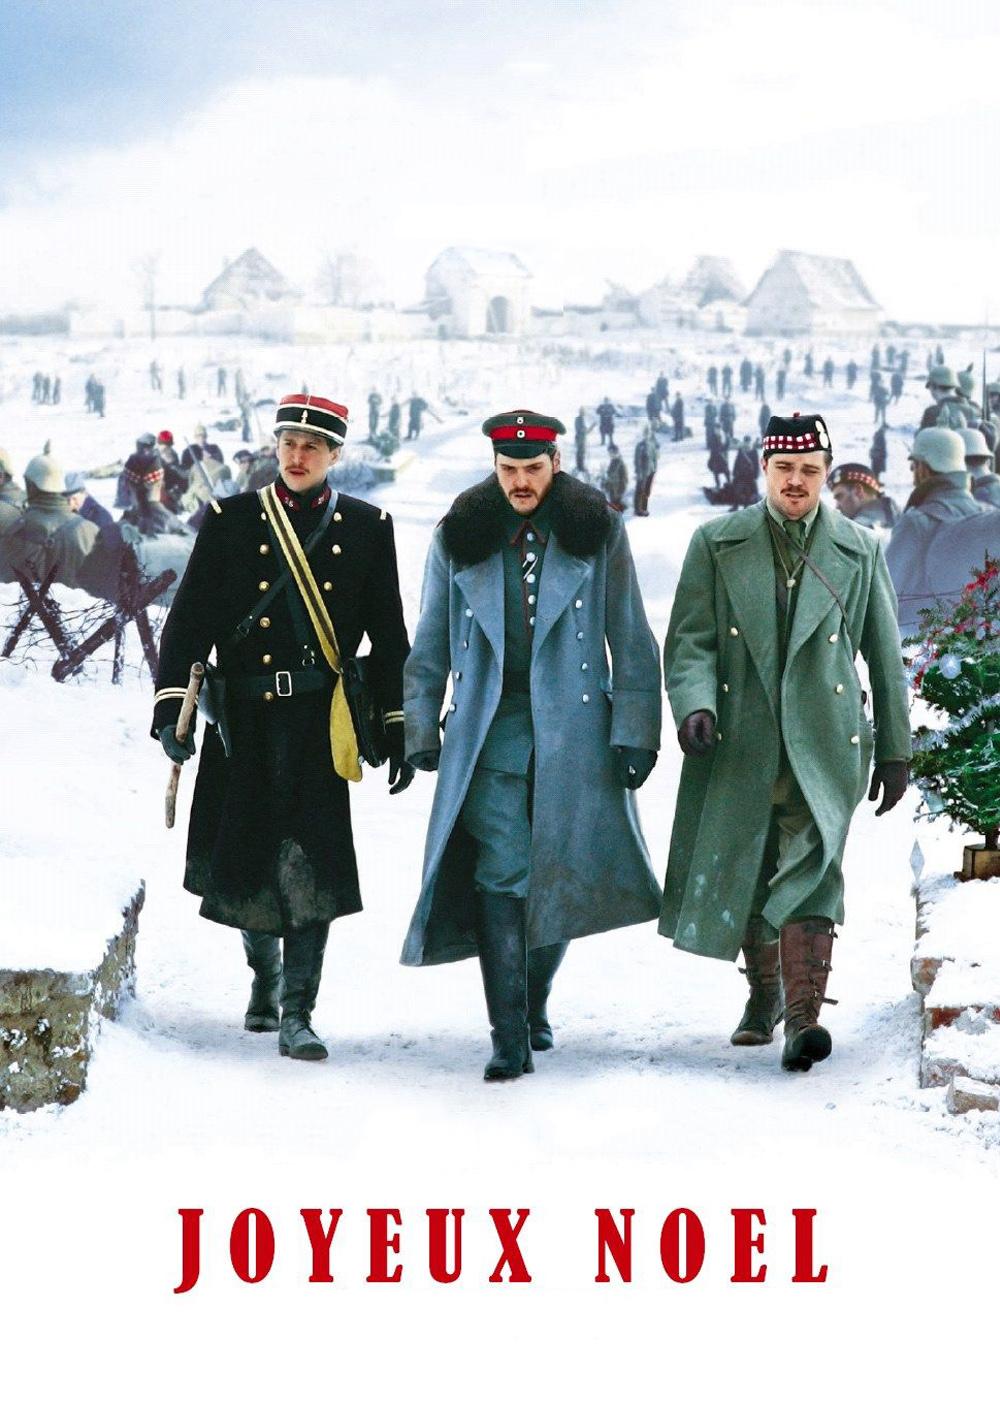 Merry Christmas Film